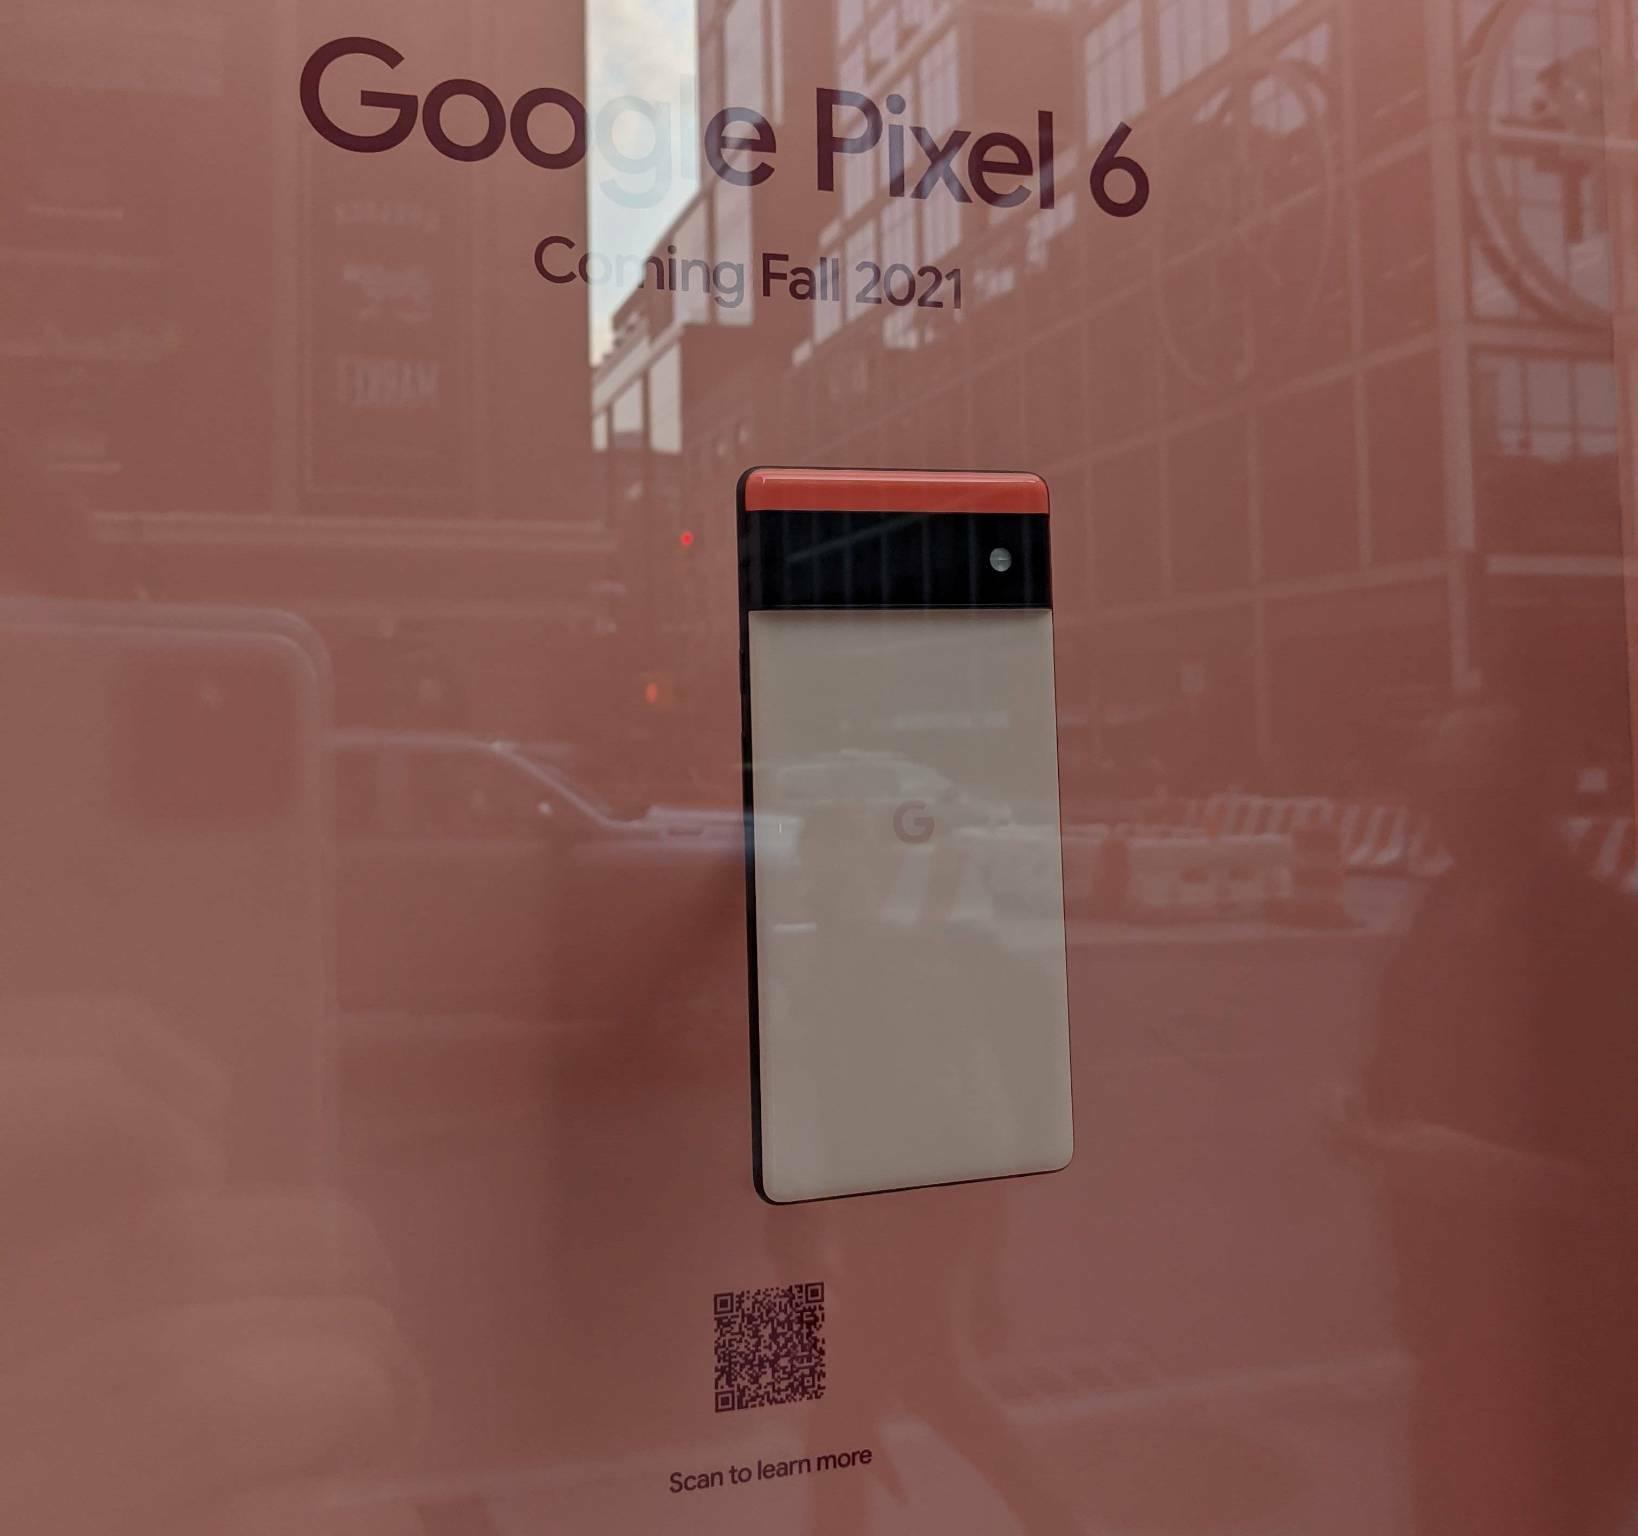 Google Pixel 6 Pro e Pixel 6 Store New York